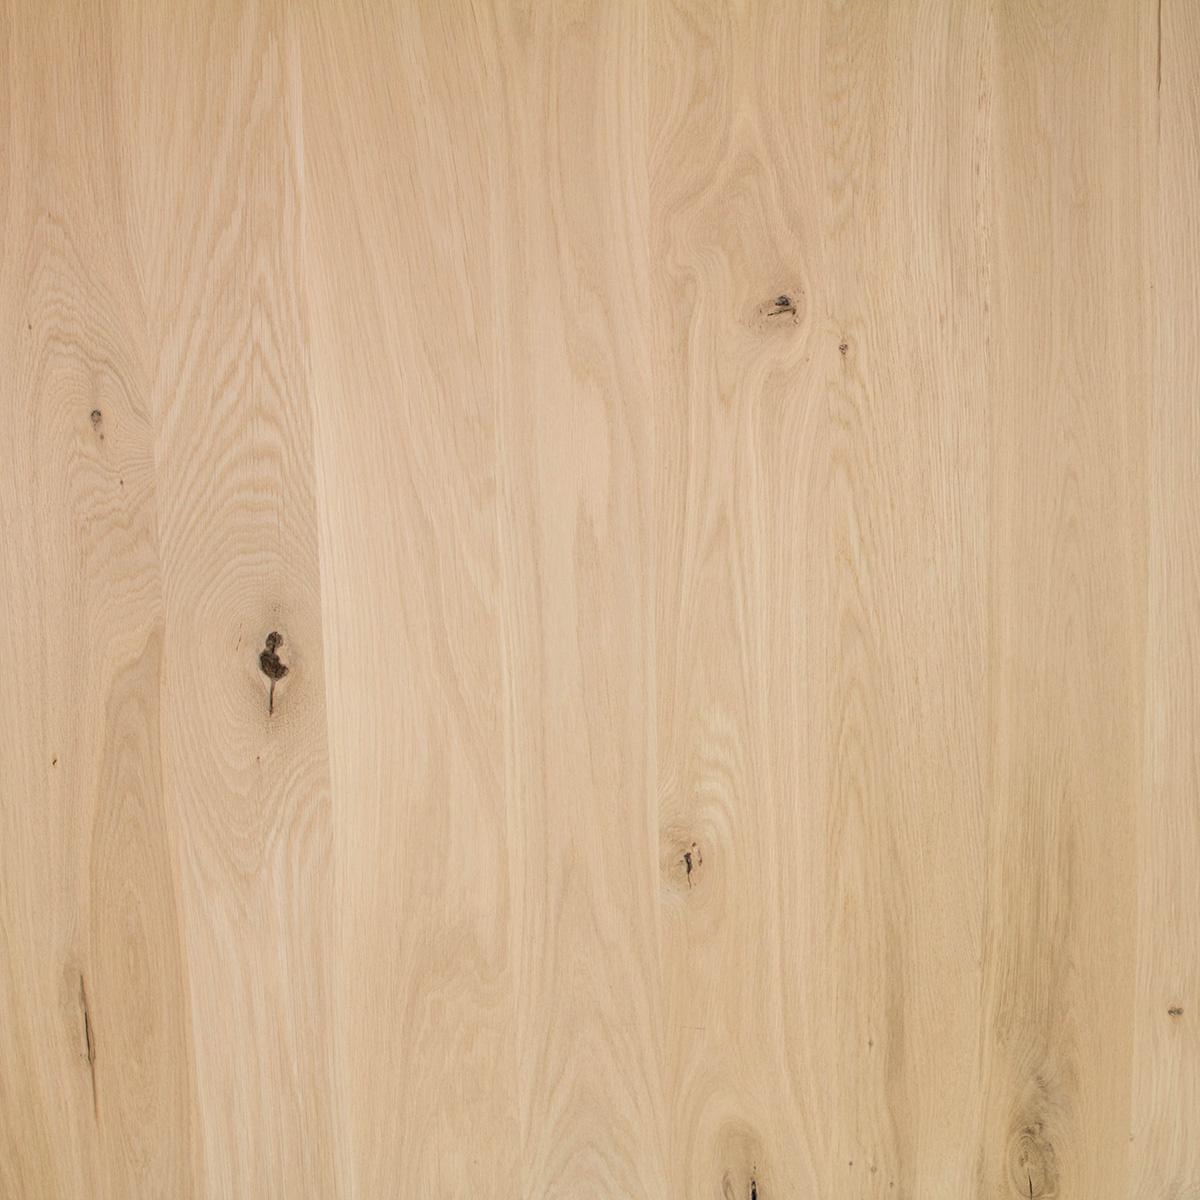 Eiken paneel rustiek 4 cm - 122 cm breed - vaste lengtestaffels - Meubelblad 8-12% kd Europees eikenhout